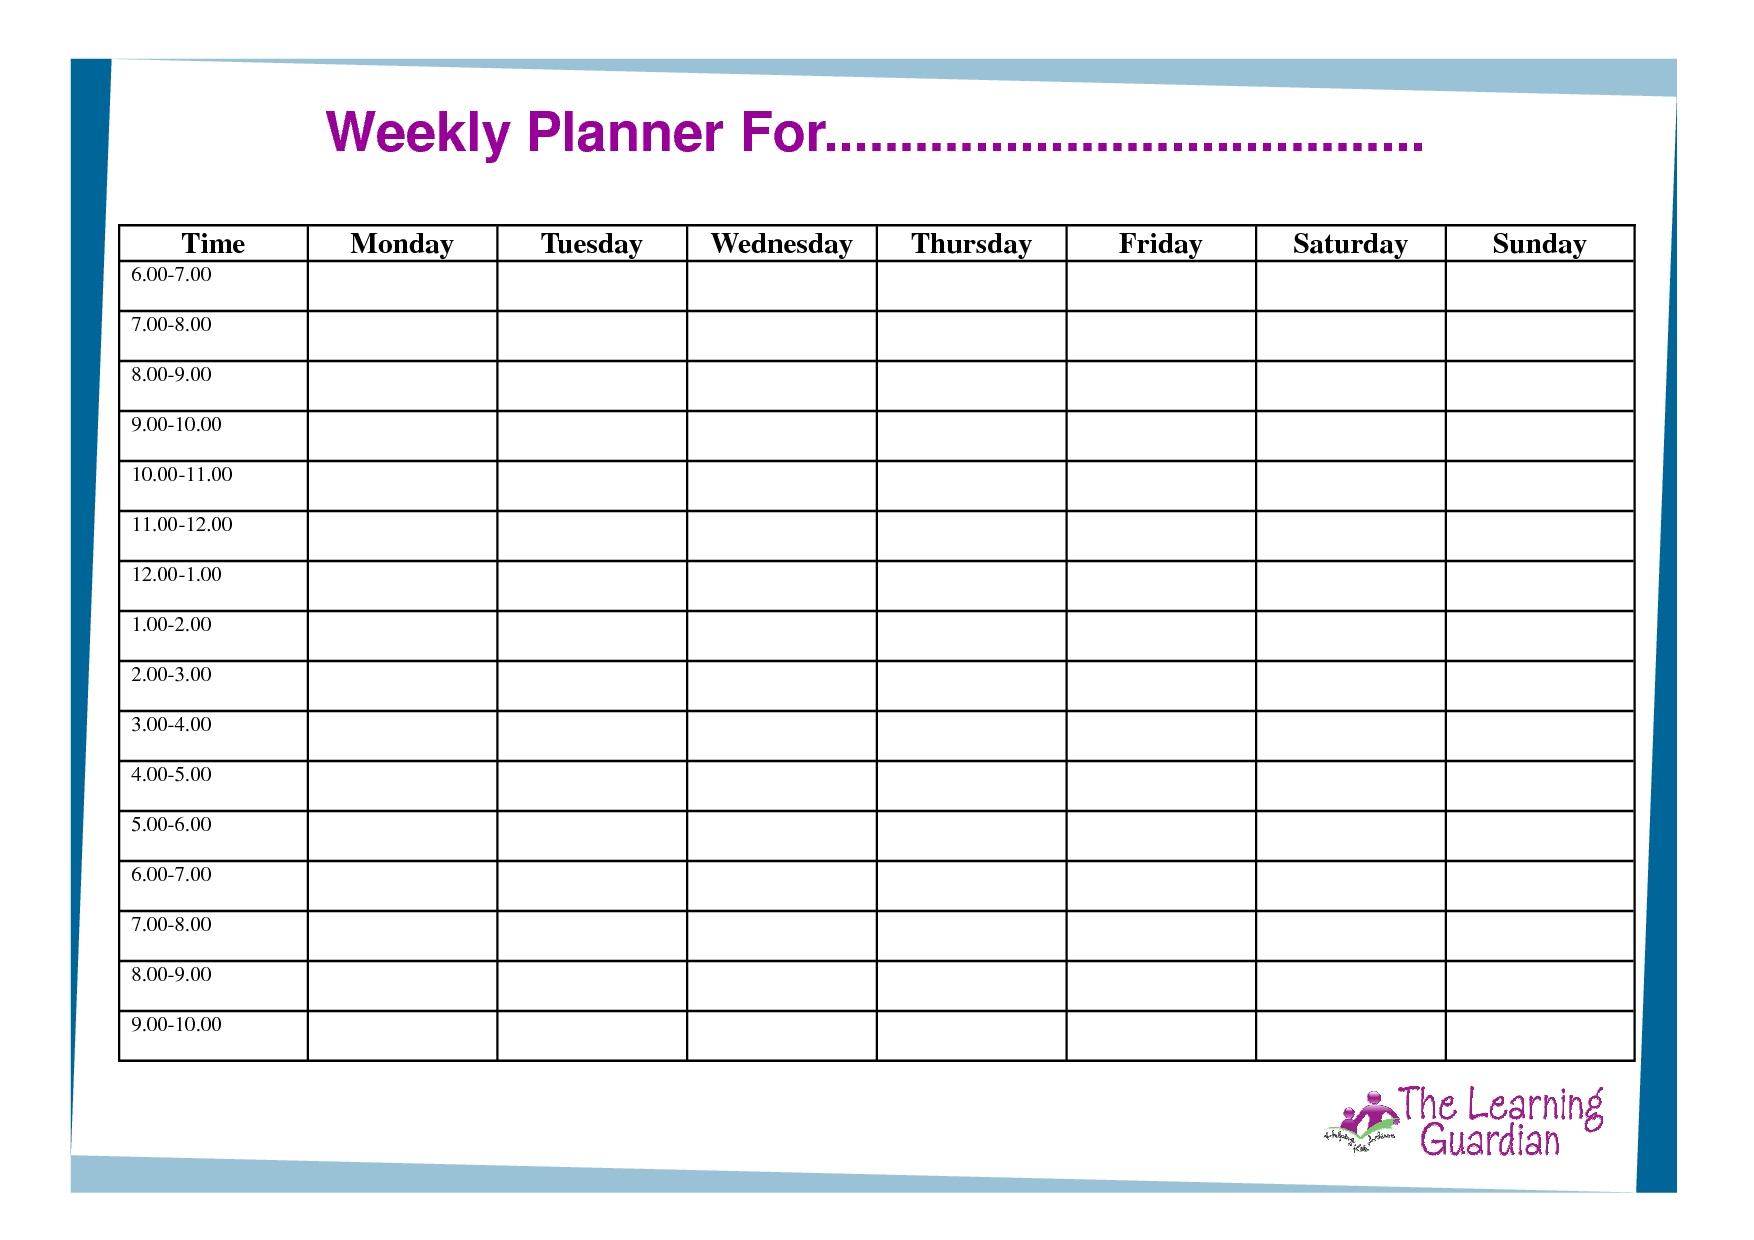 Week Calendar Template Day Blank | Smorad throughout Blank 7 Day Week Calendar